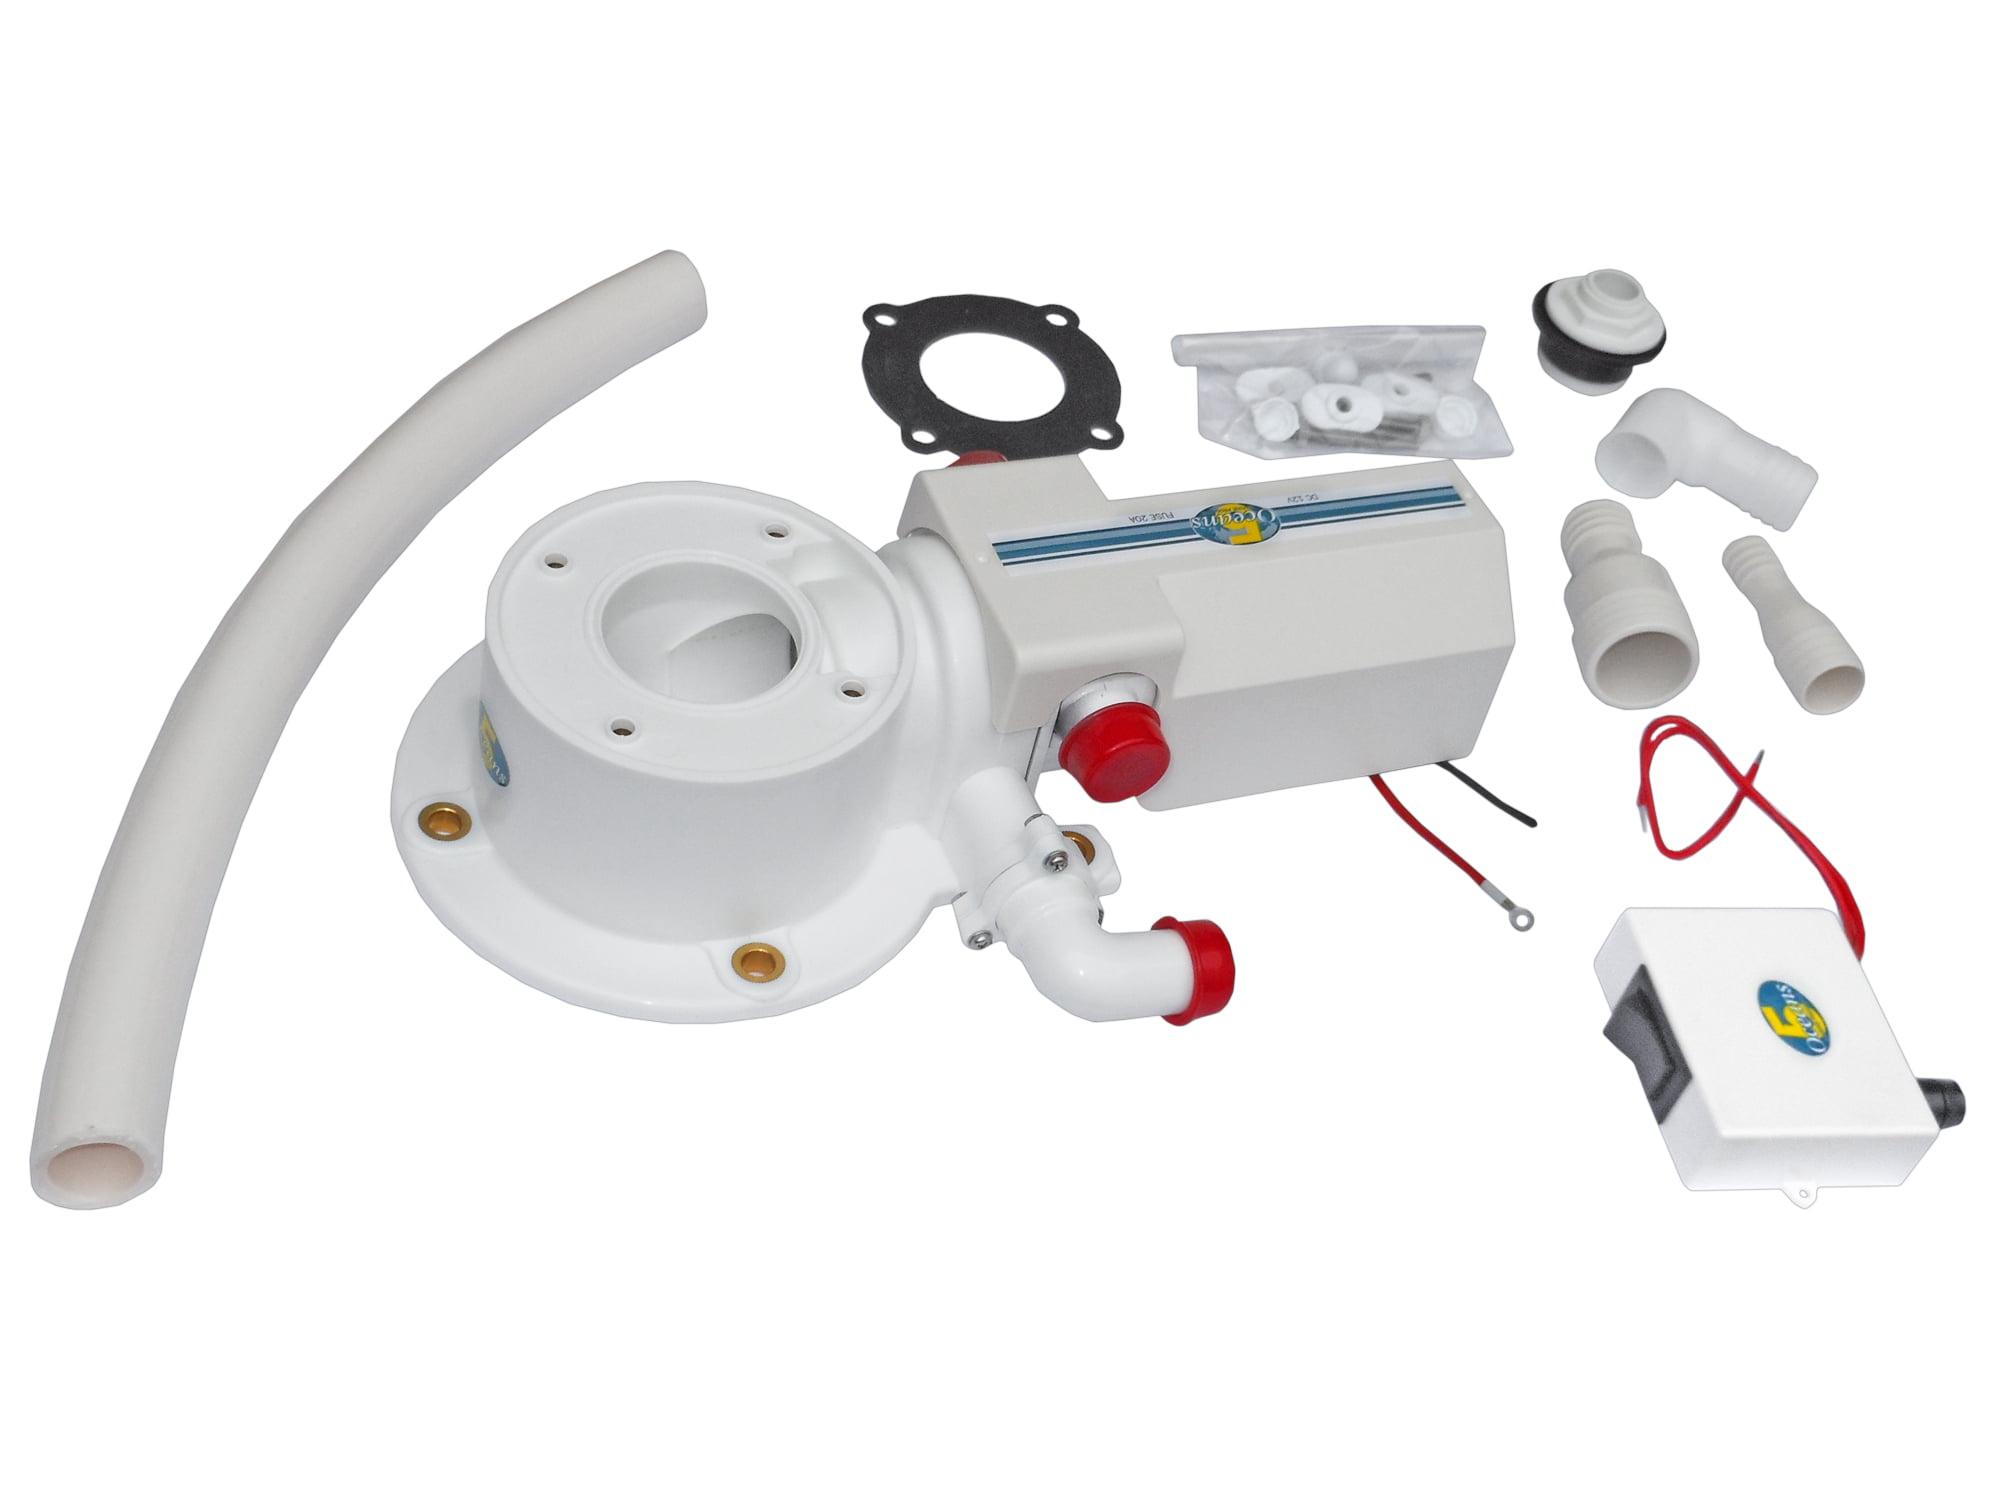 TMC Electric Marine Toilet Conversion Kit BC 728 by